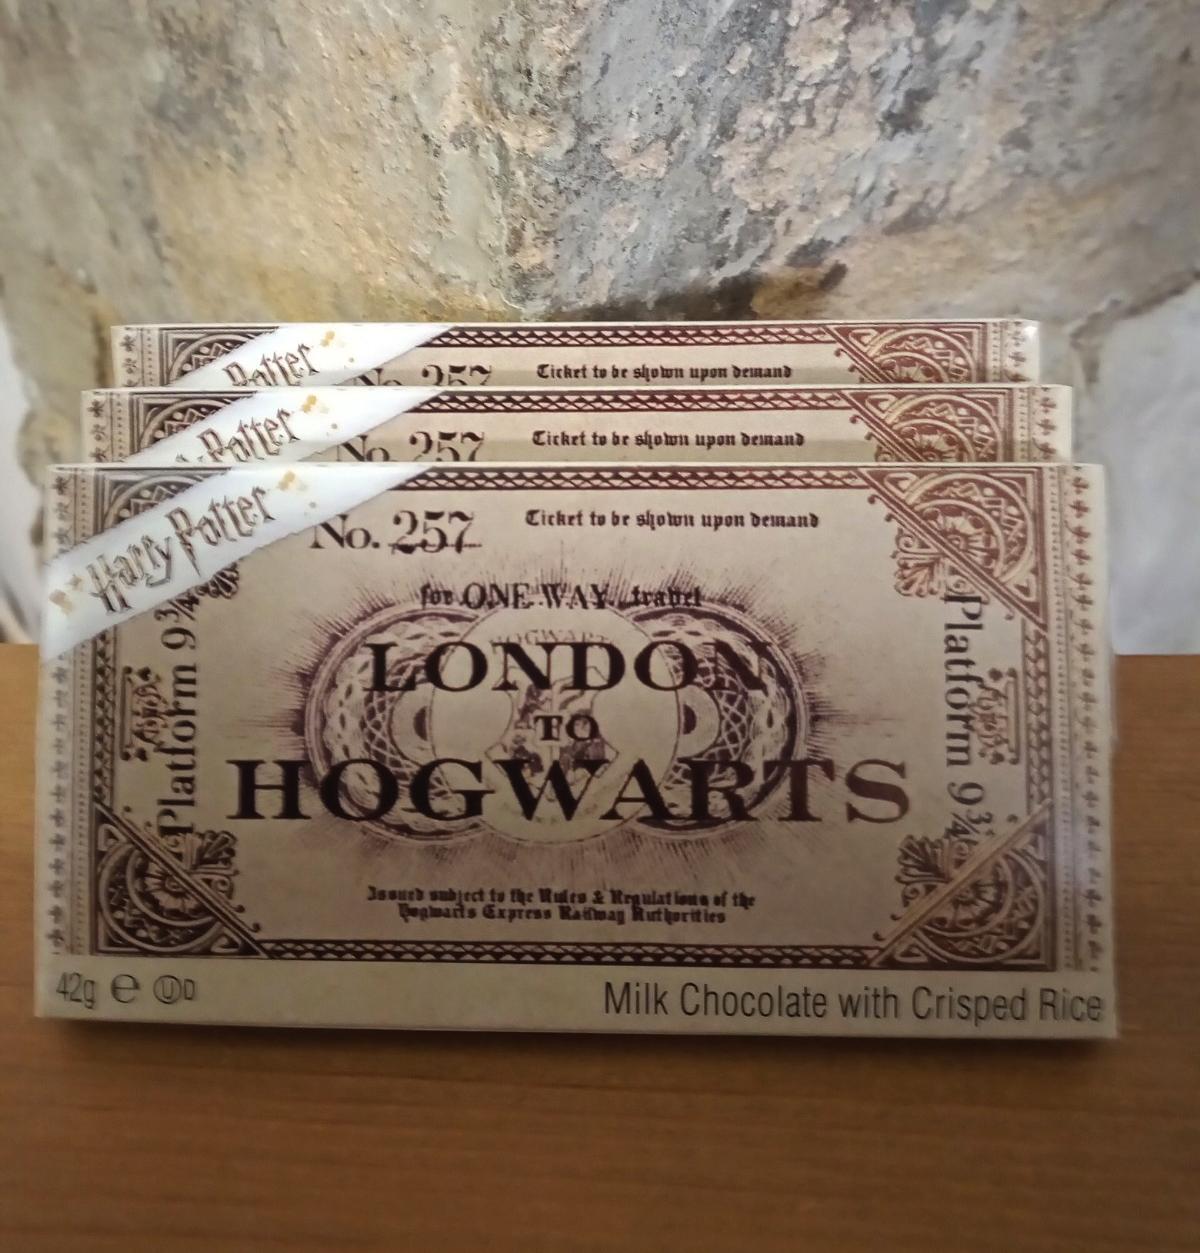 Harry Potter Ticket to Hogwarts